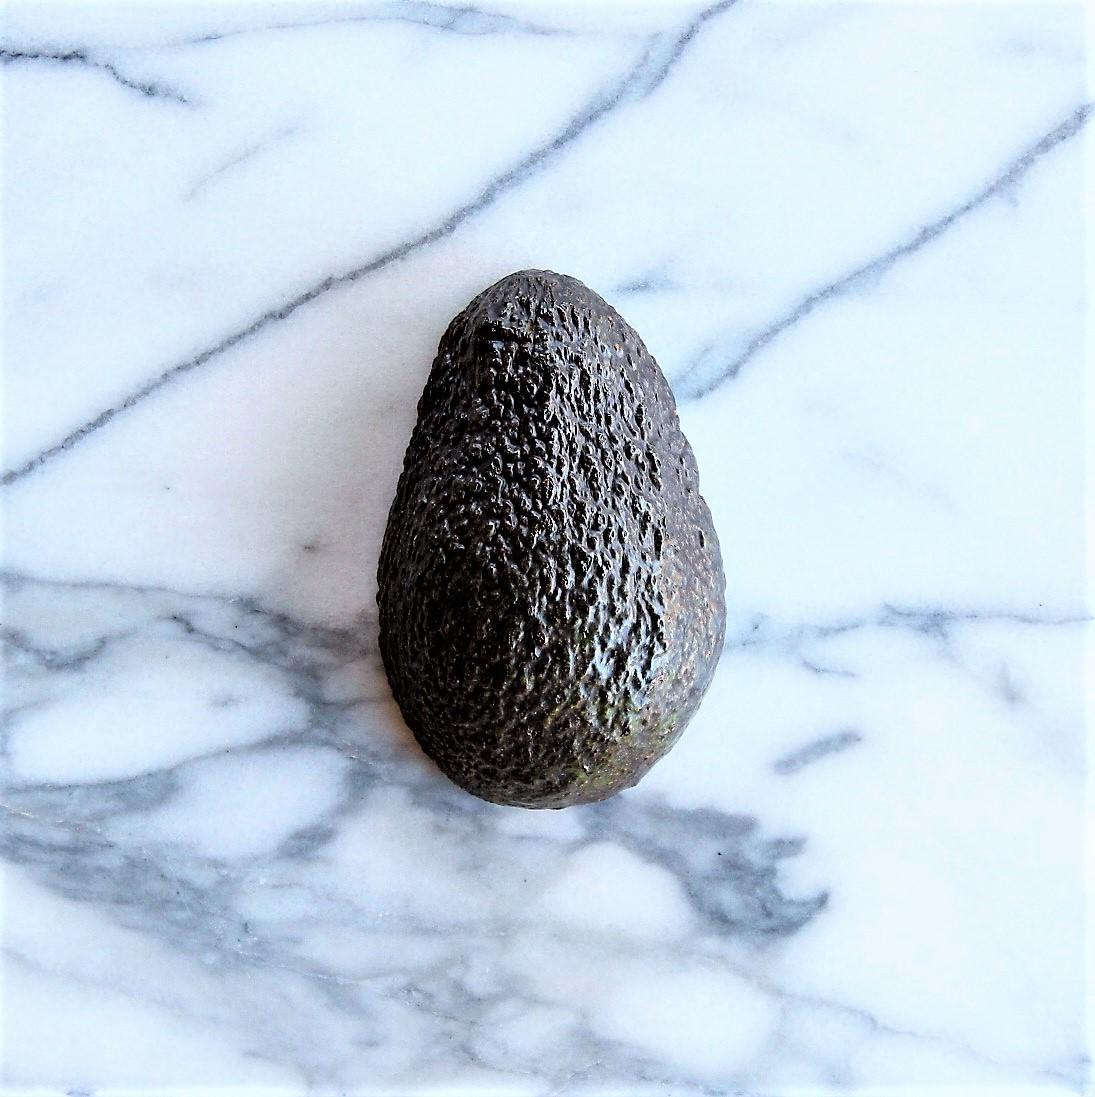 Turn the avocado half face down.